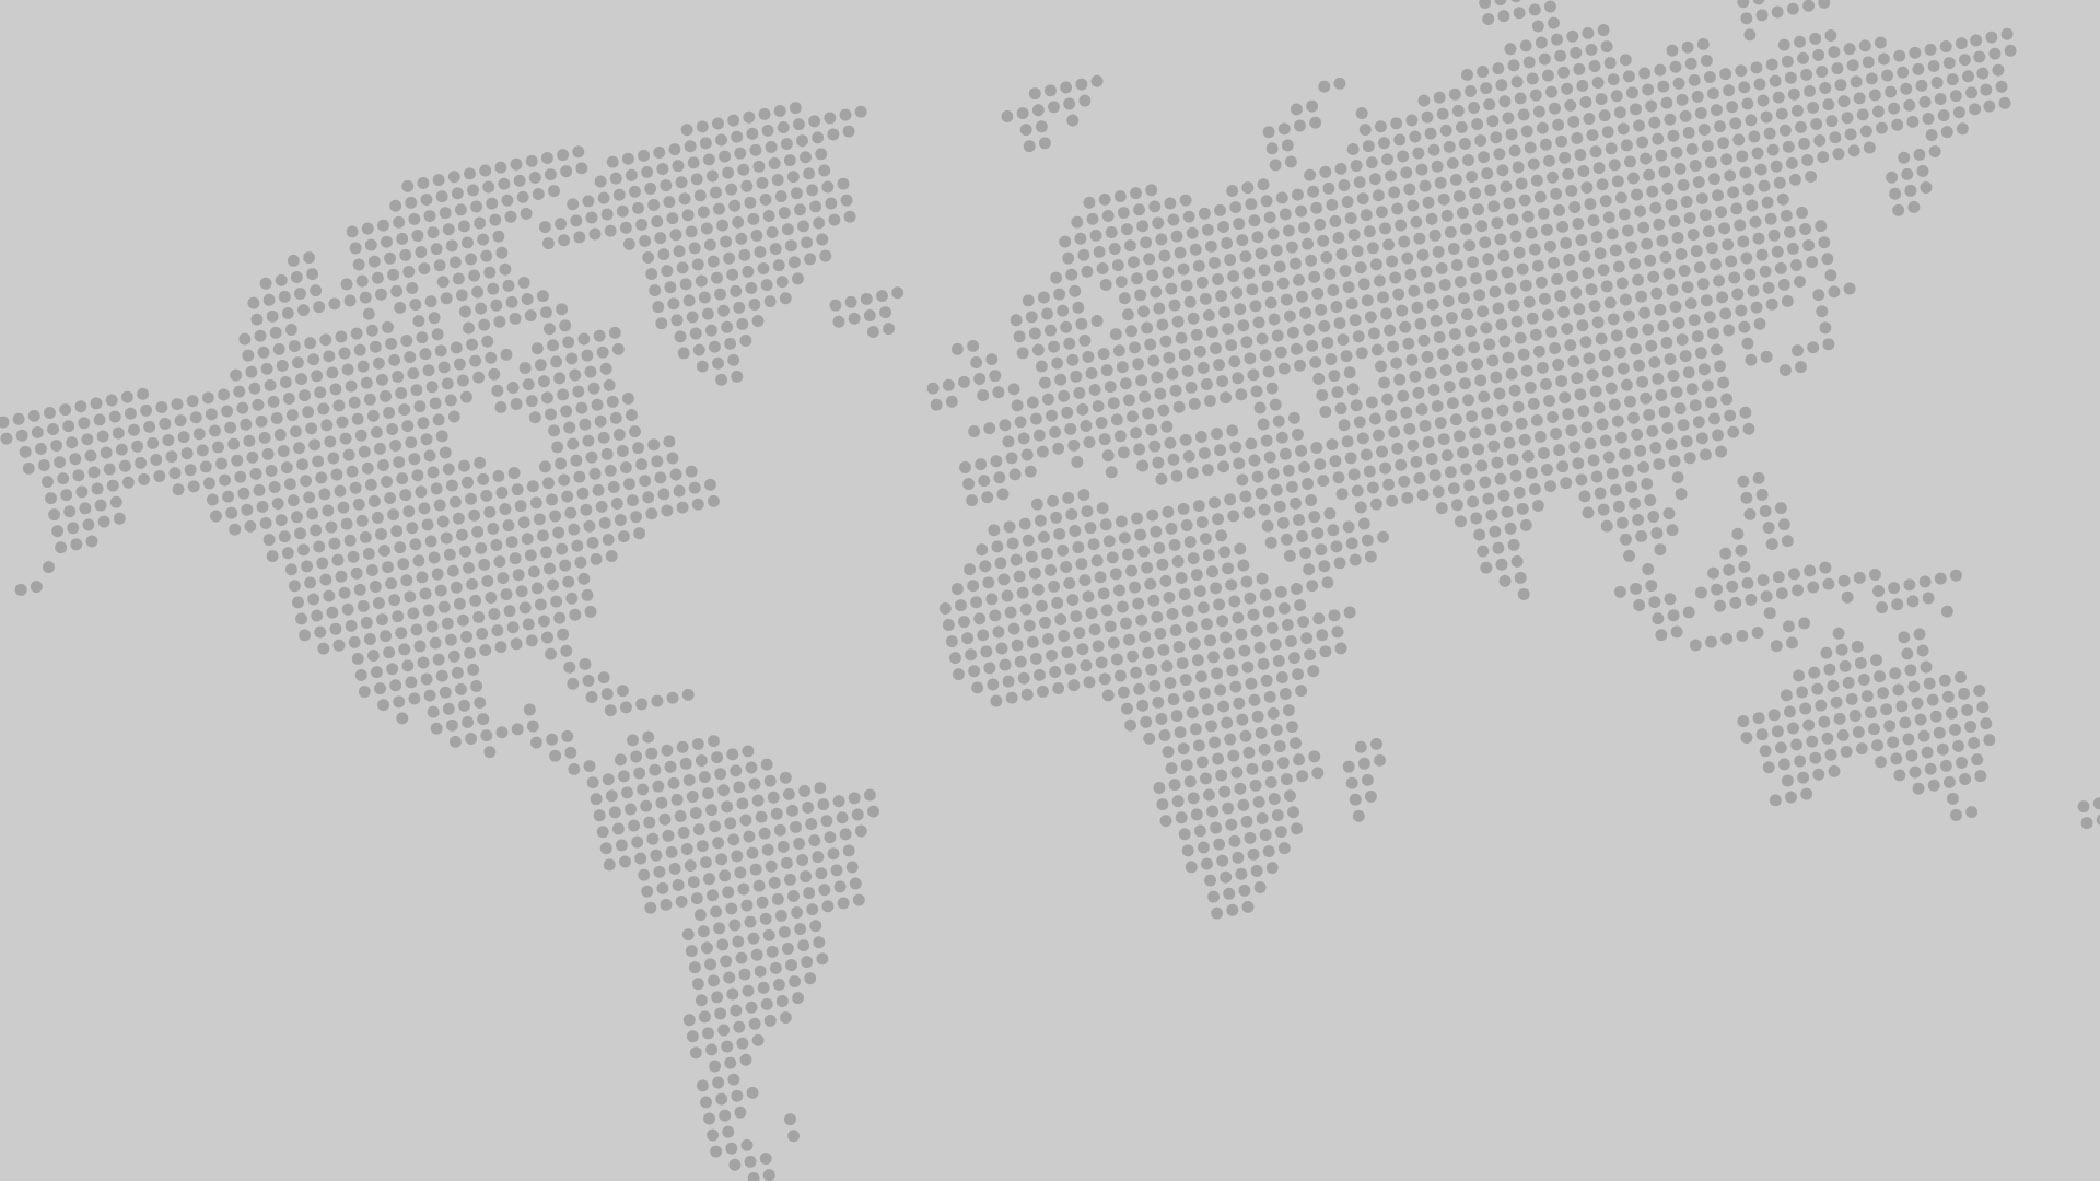 website backgrounds